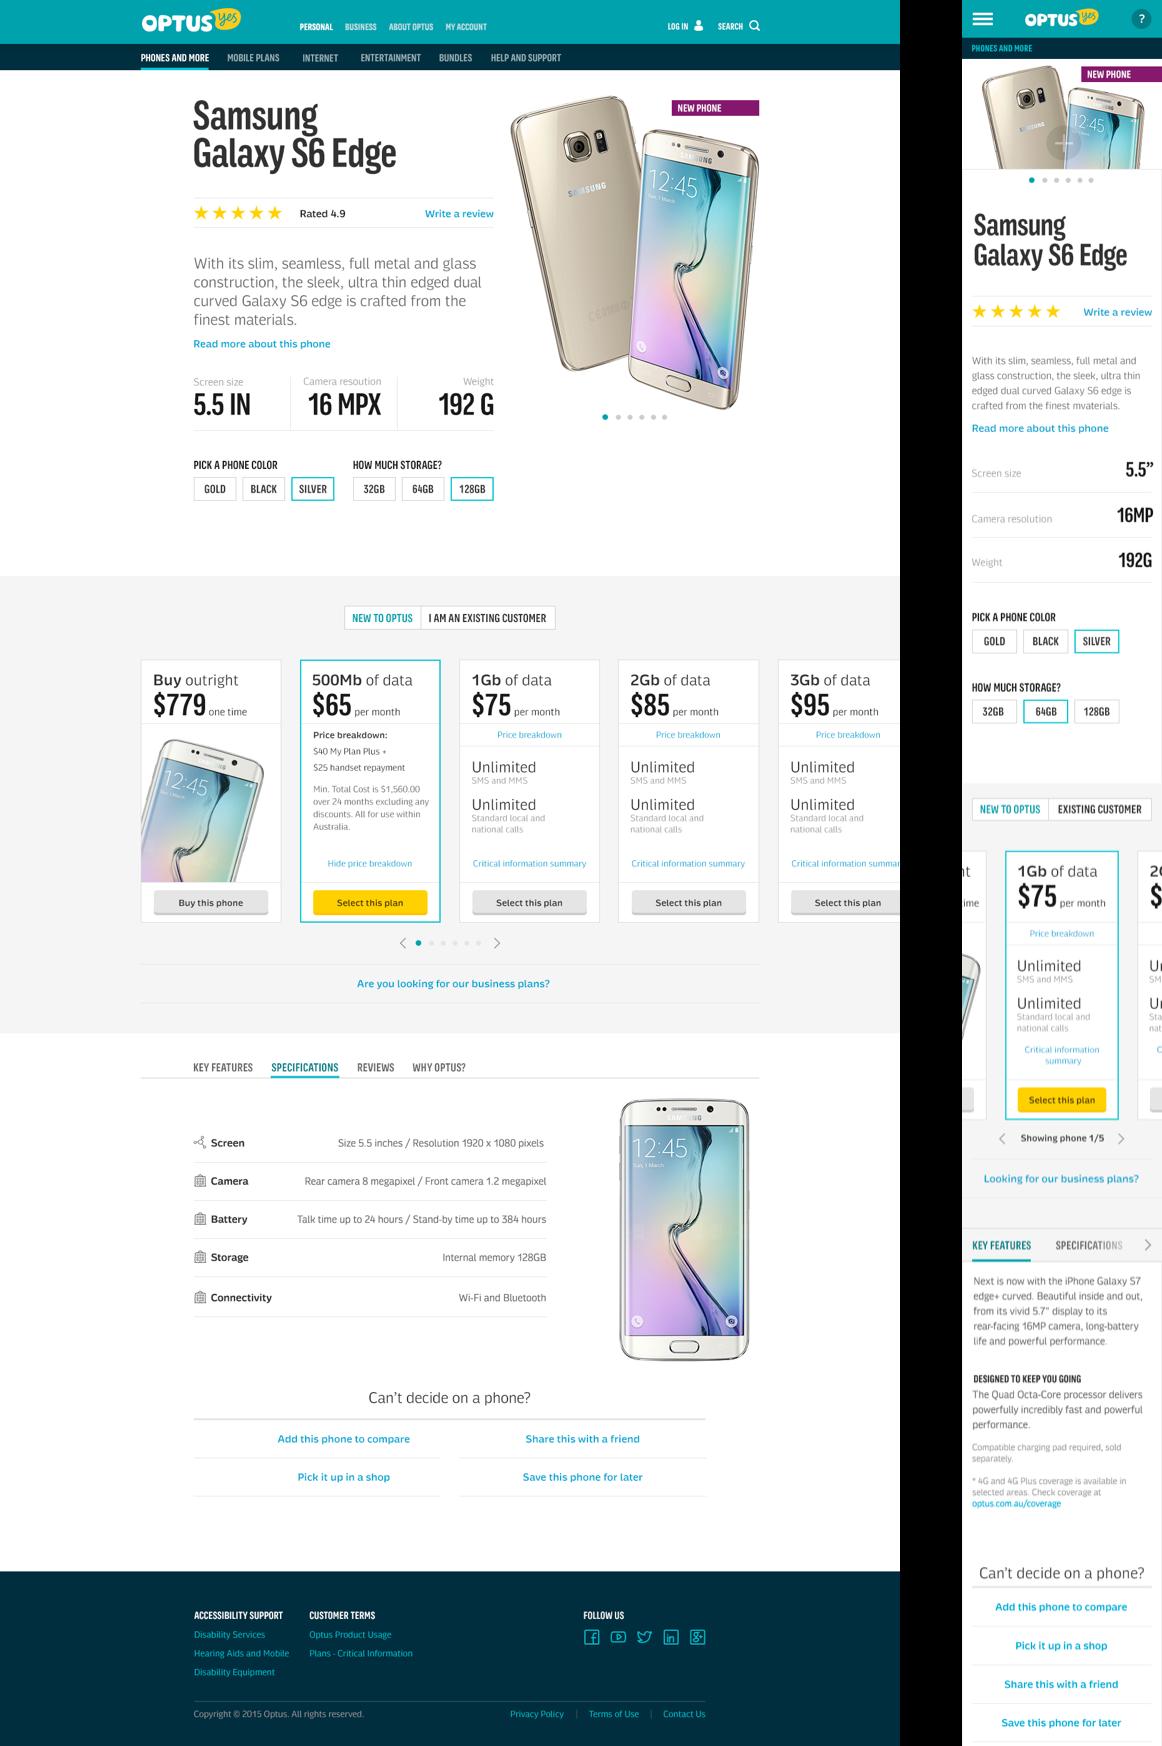 Desktop versus mobile version